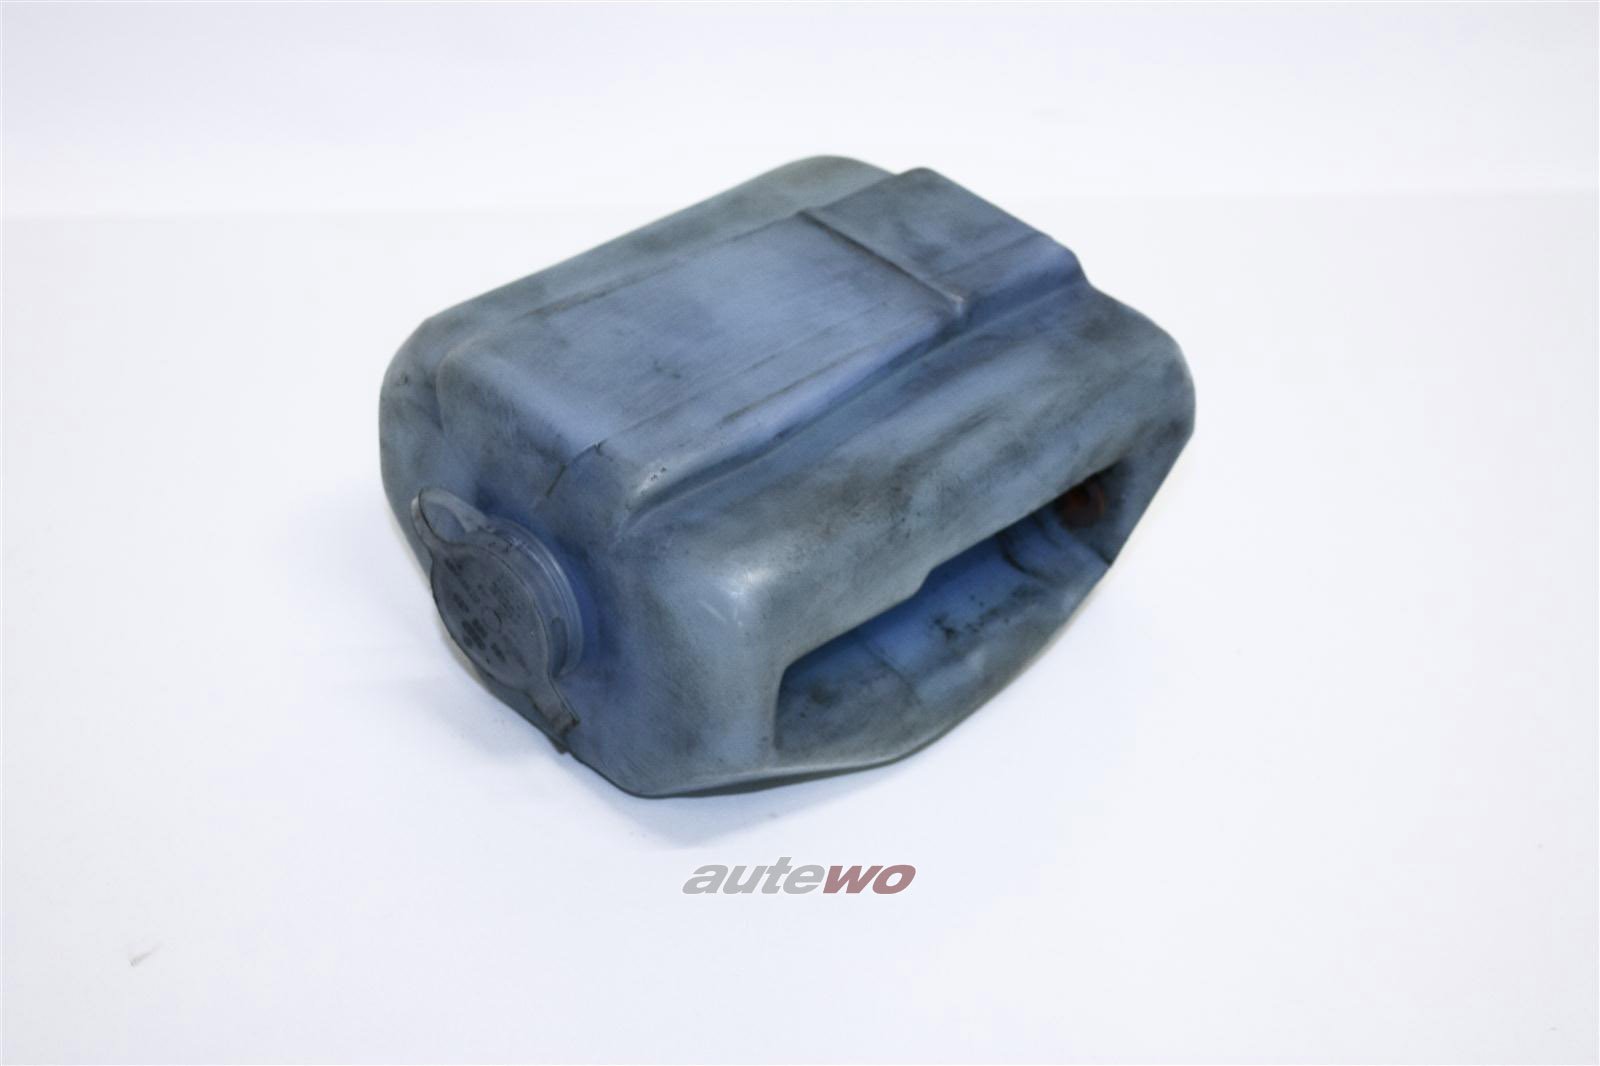 Audi 100/200 Typ 44 Scheibenwaschbehälter 431955453E 431955453E